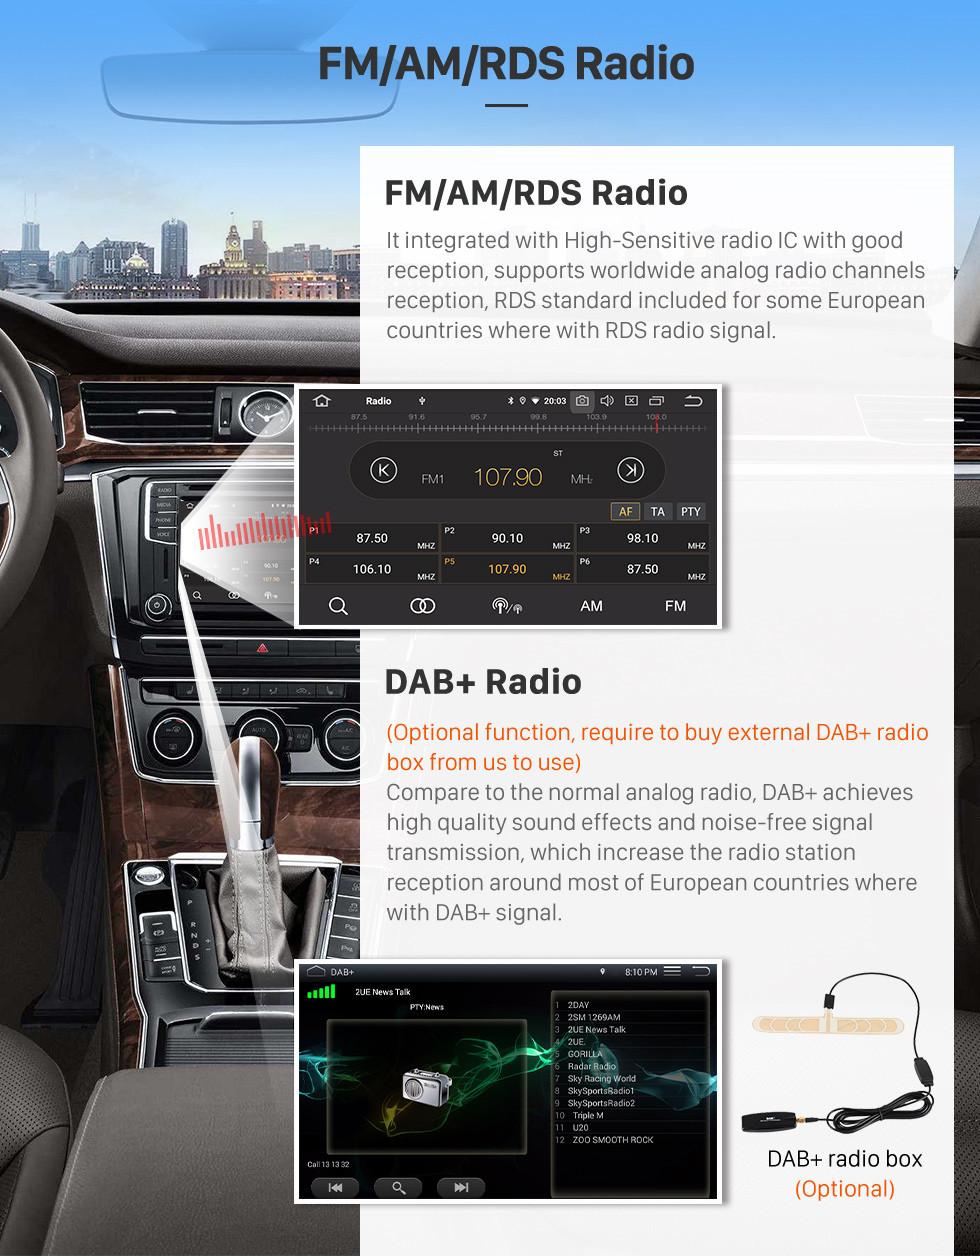 Seicane Pantalla táctil HD 2015 Mahindra TUV300 Android 10.0 9 pulgadas Navegación GPS Radio Bluetooth USB Carplay WIFI AUX ayuda DAB + Control del volante